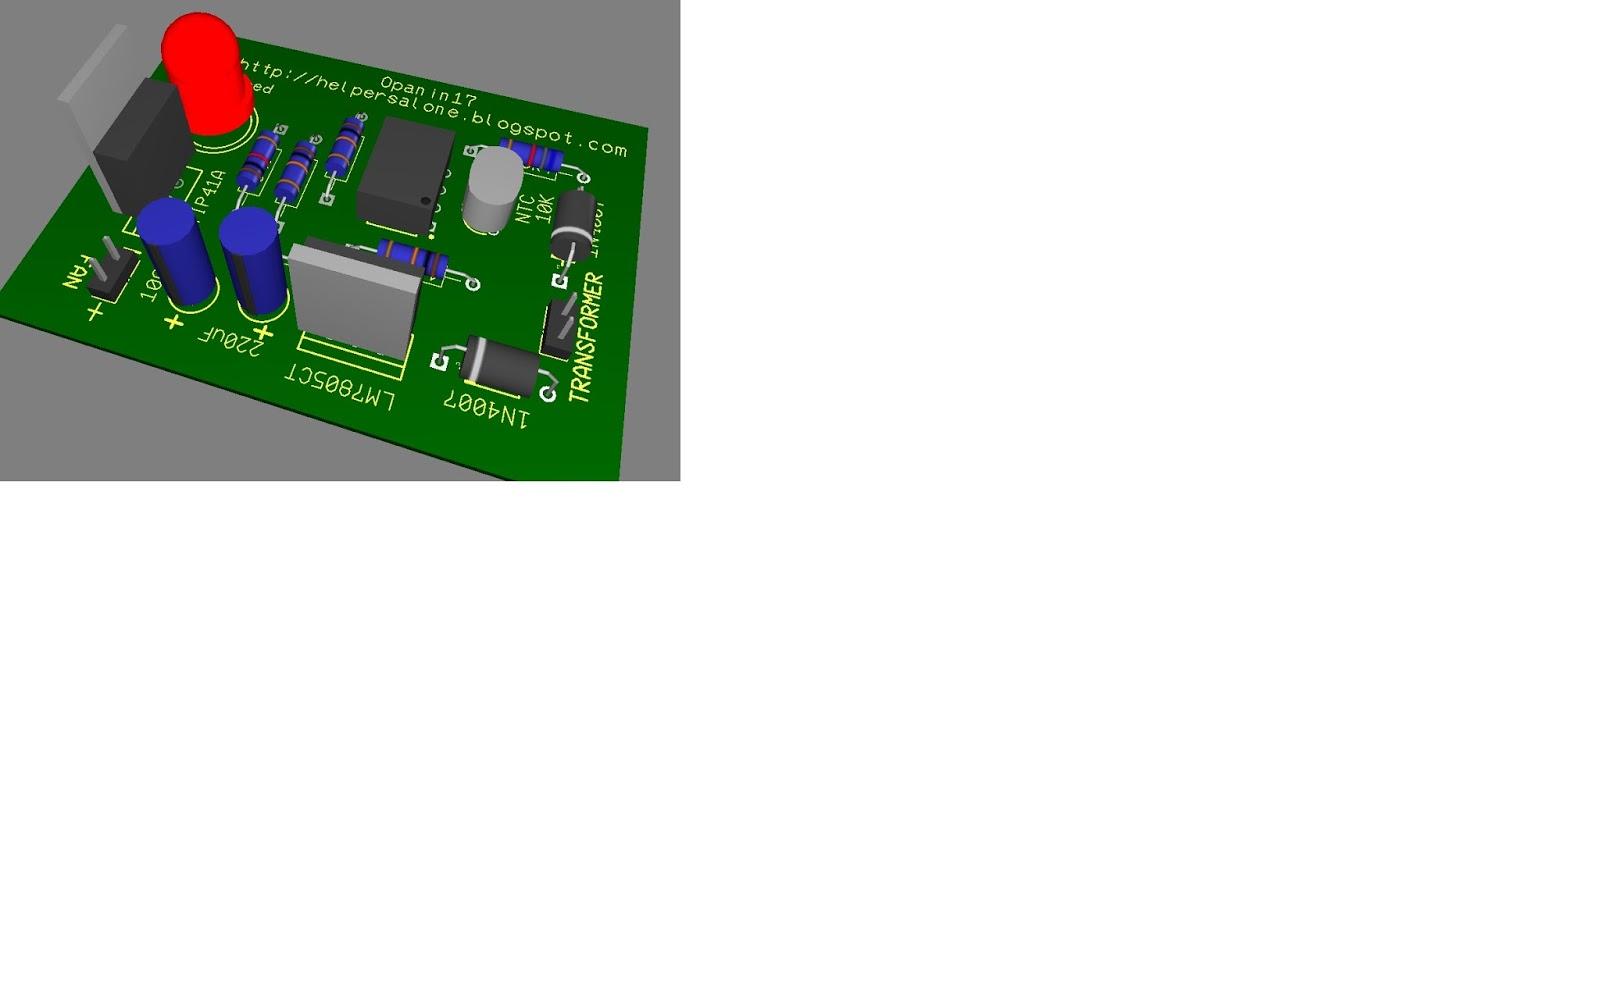 Fan Control Circuit Many Circuits The Circiut Board